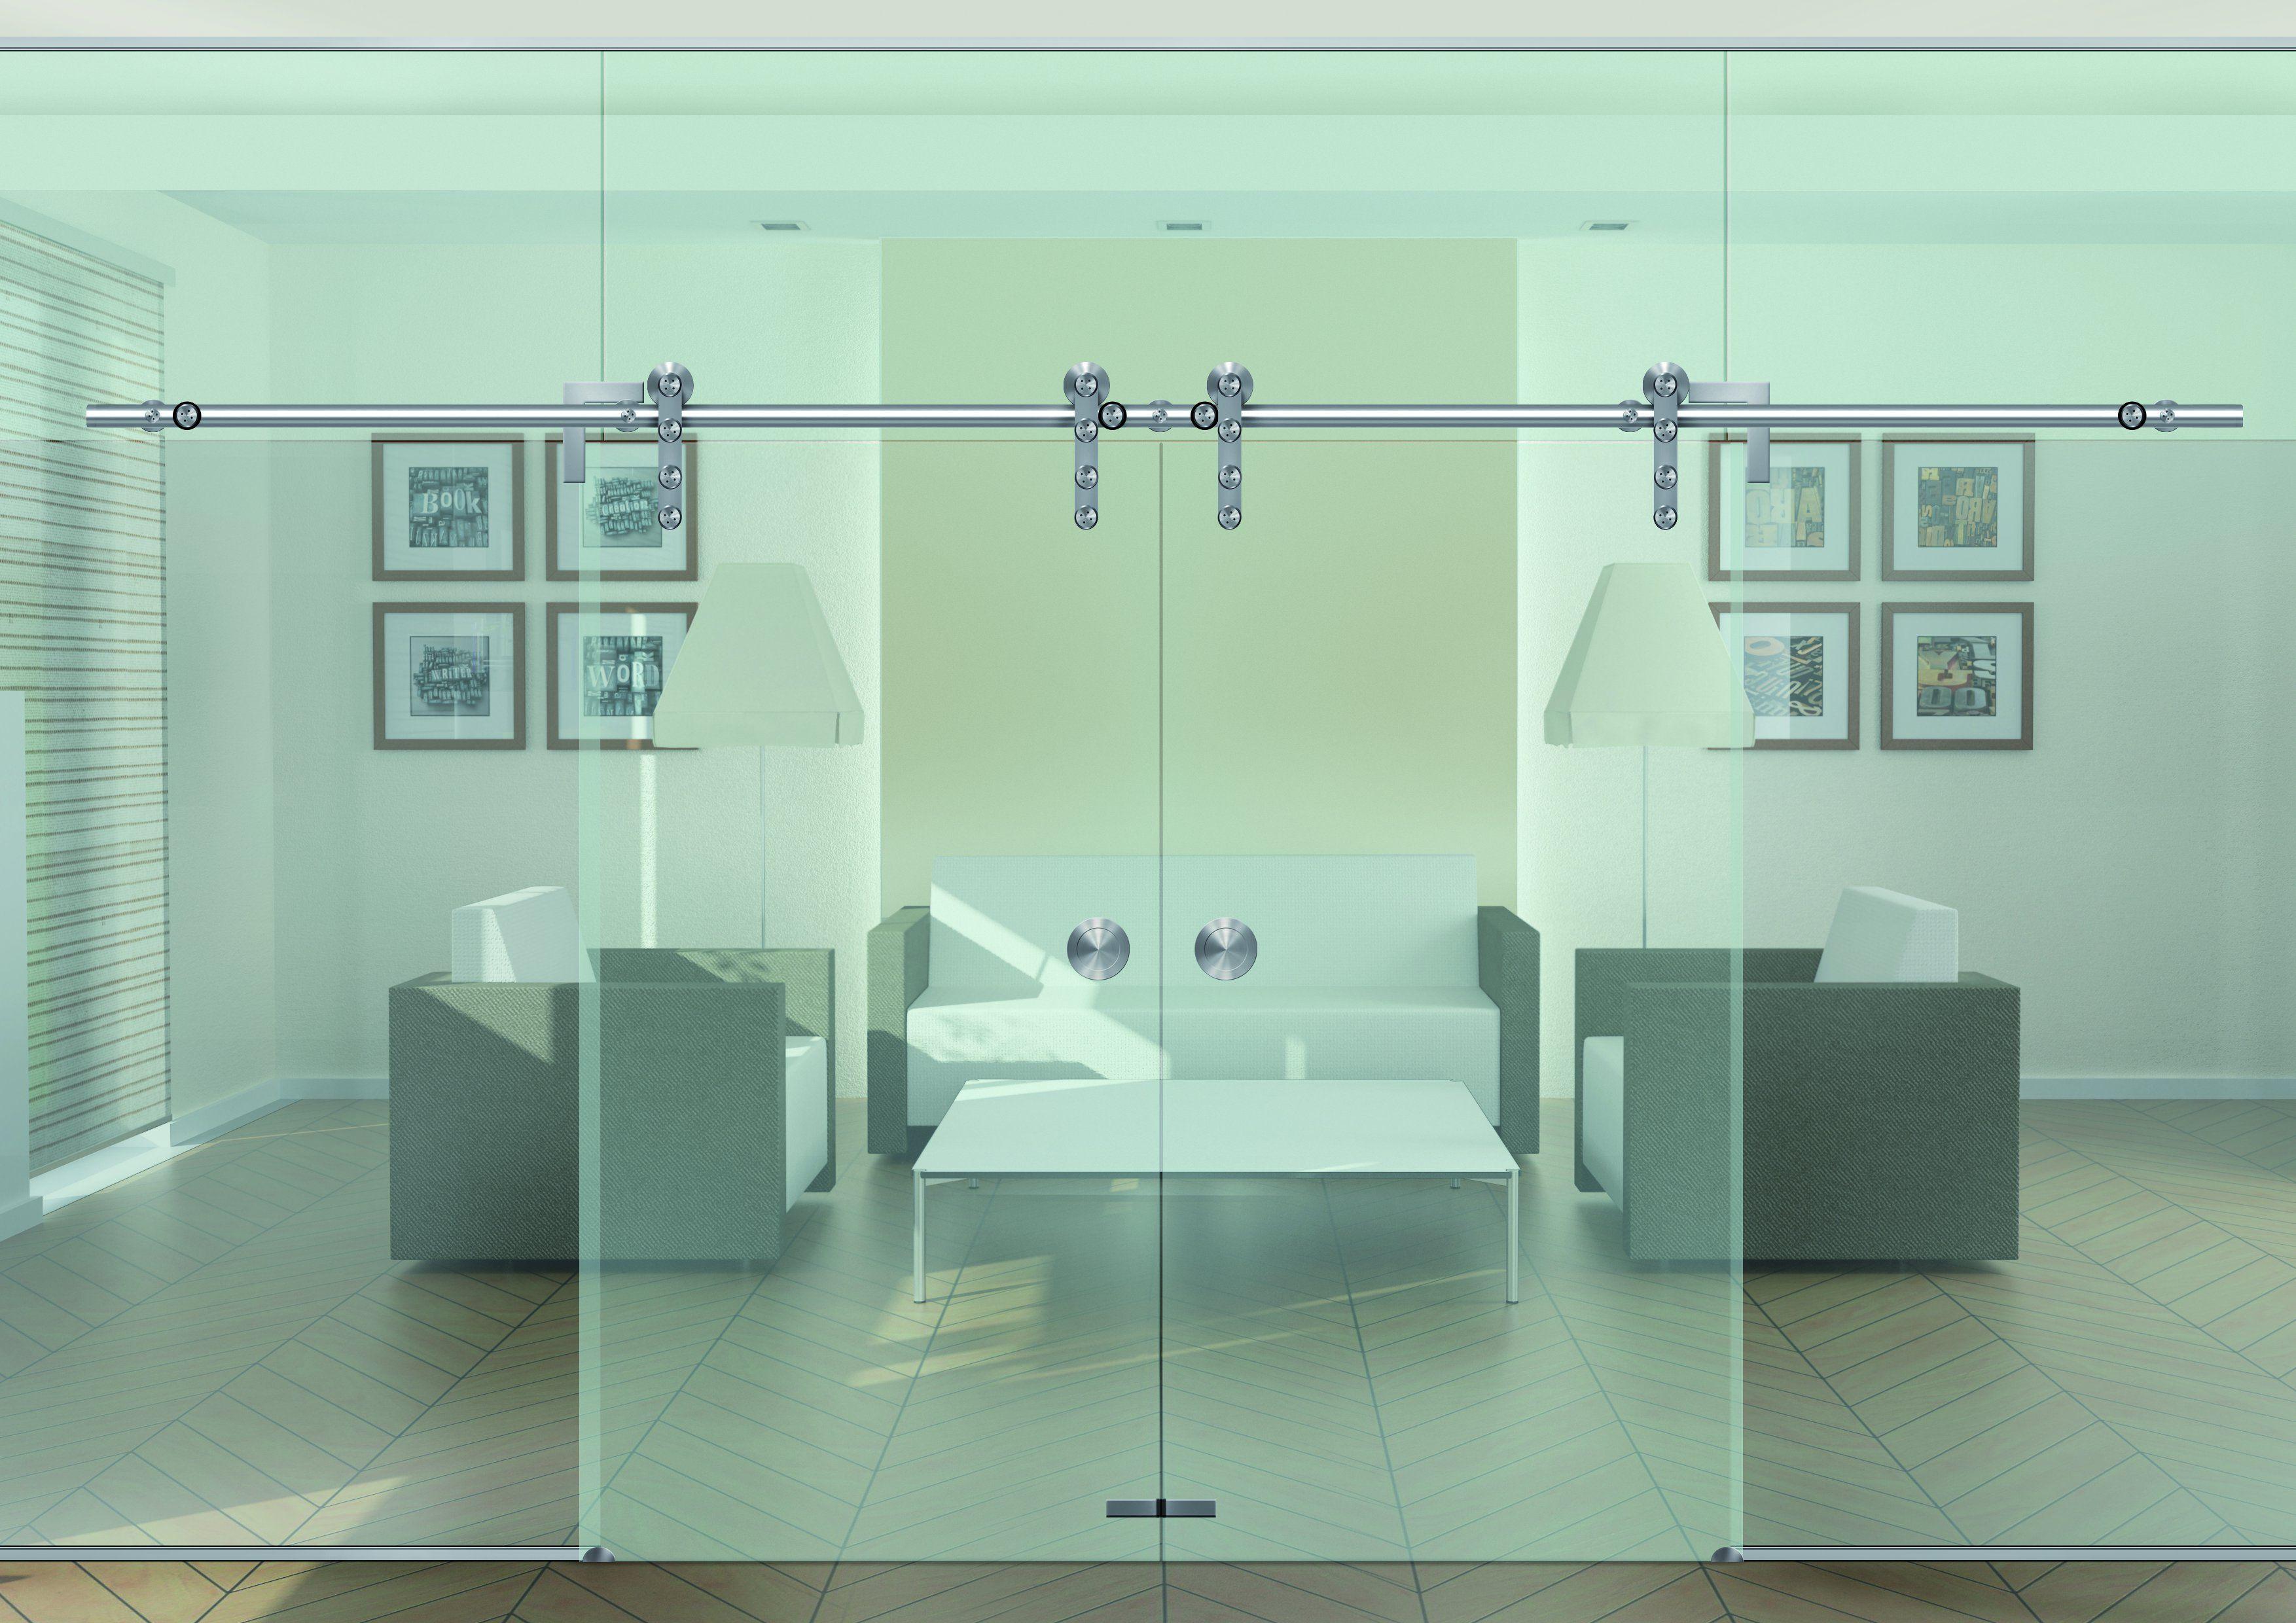 Elegant Frameless Sliding Glass Doors   Google Search   Architecture   Pinterest    Sliding Glass Door, Glass Doors And Doors Design Ideas